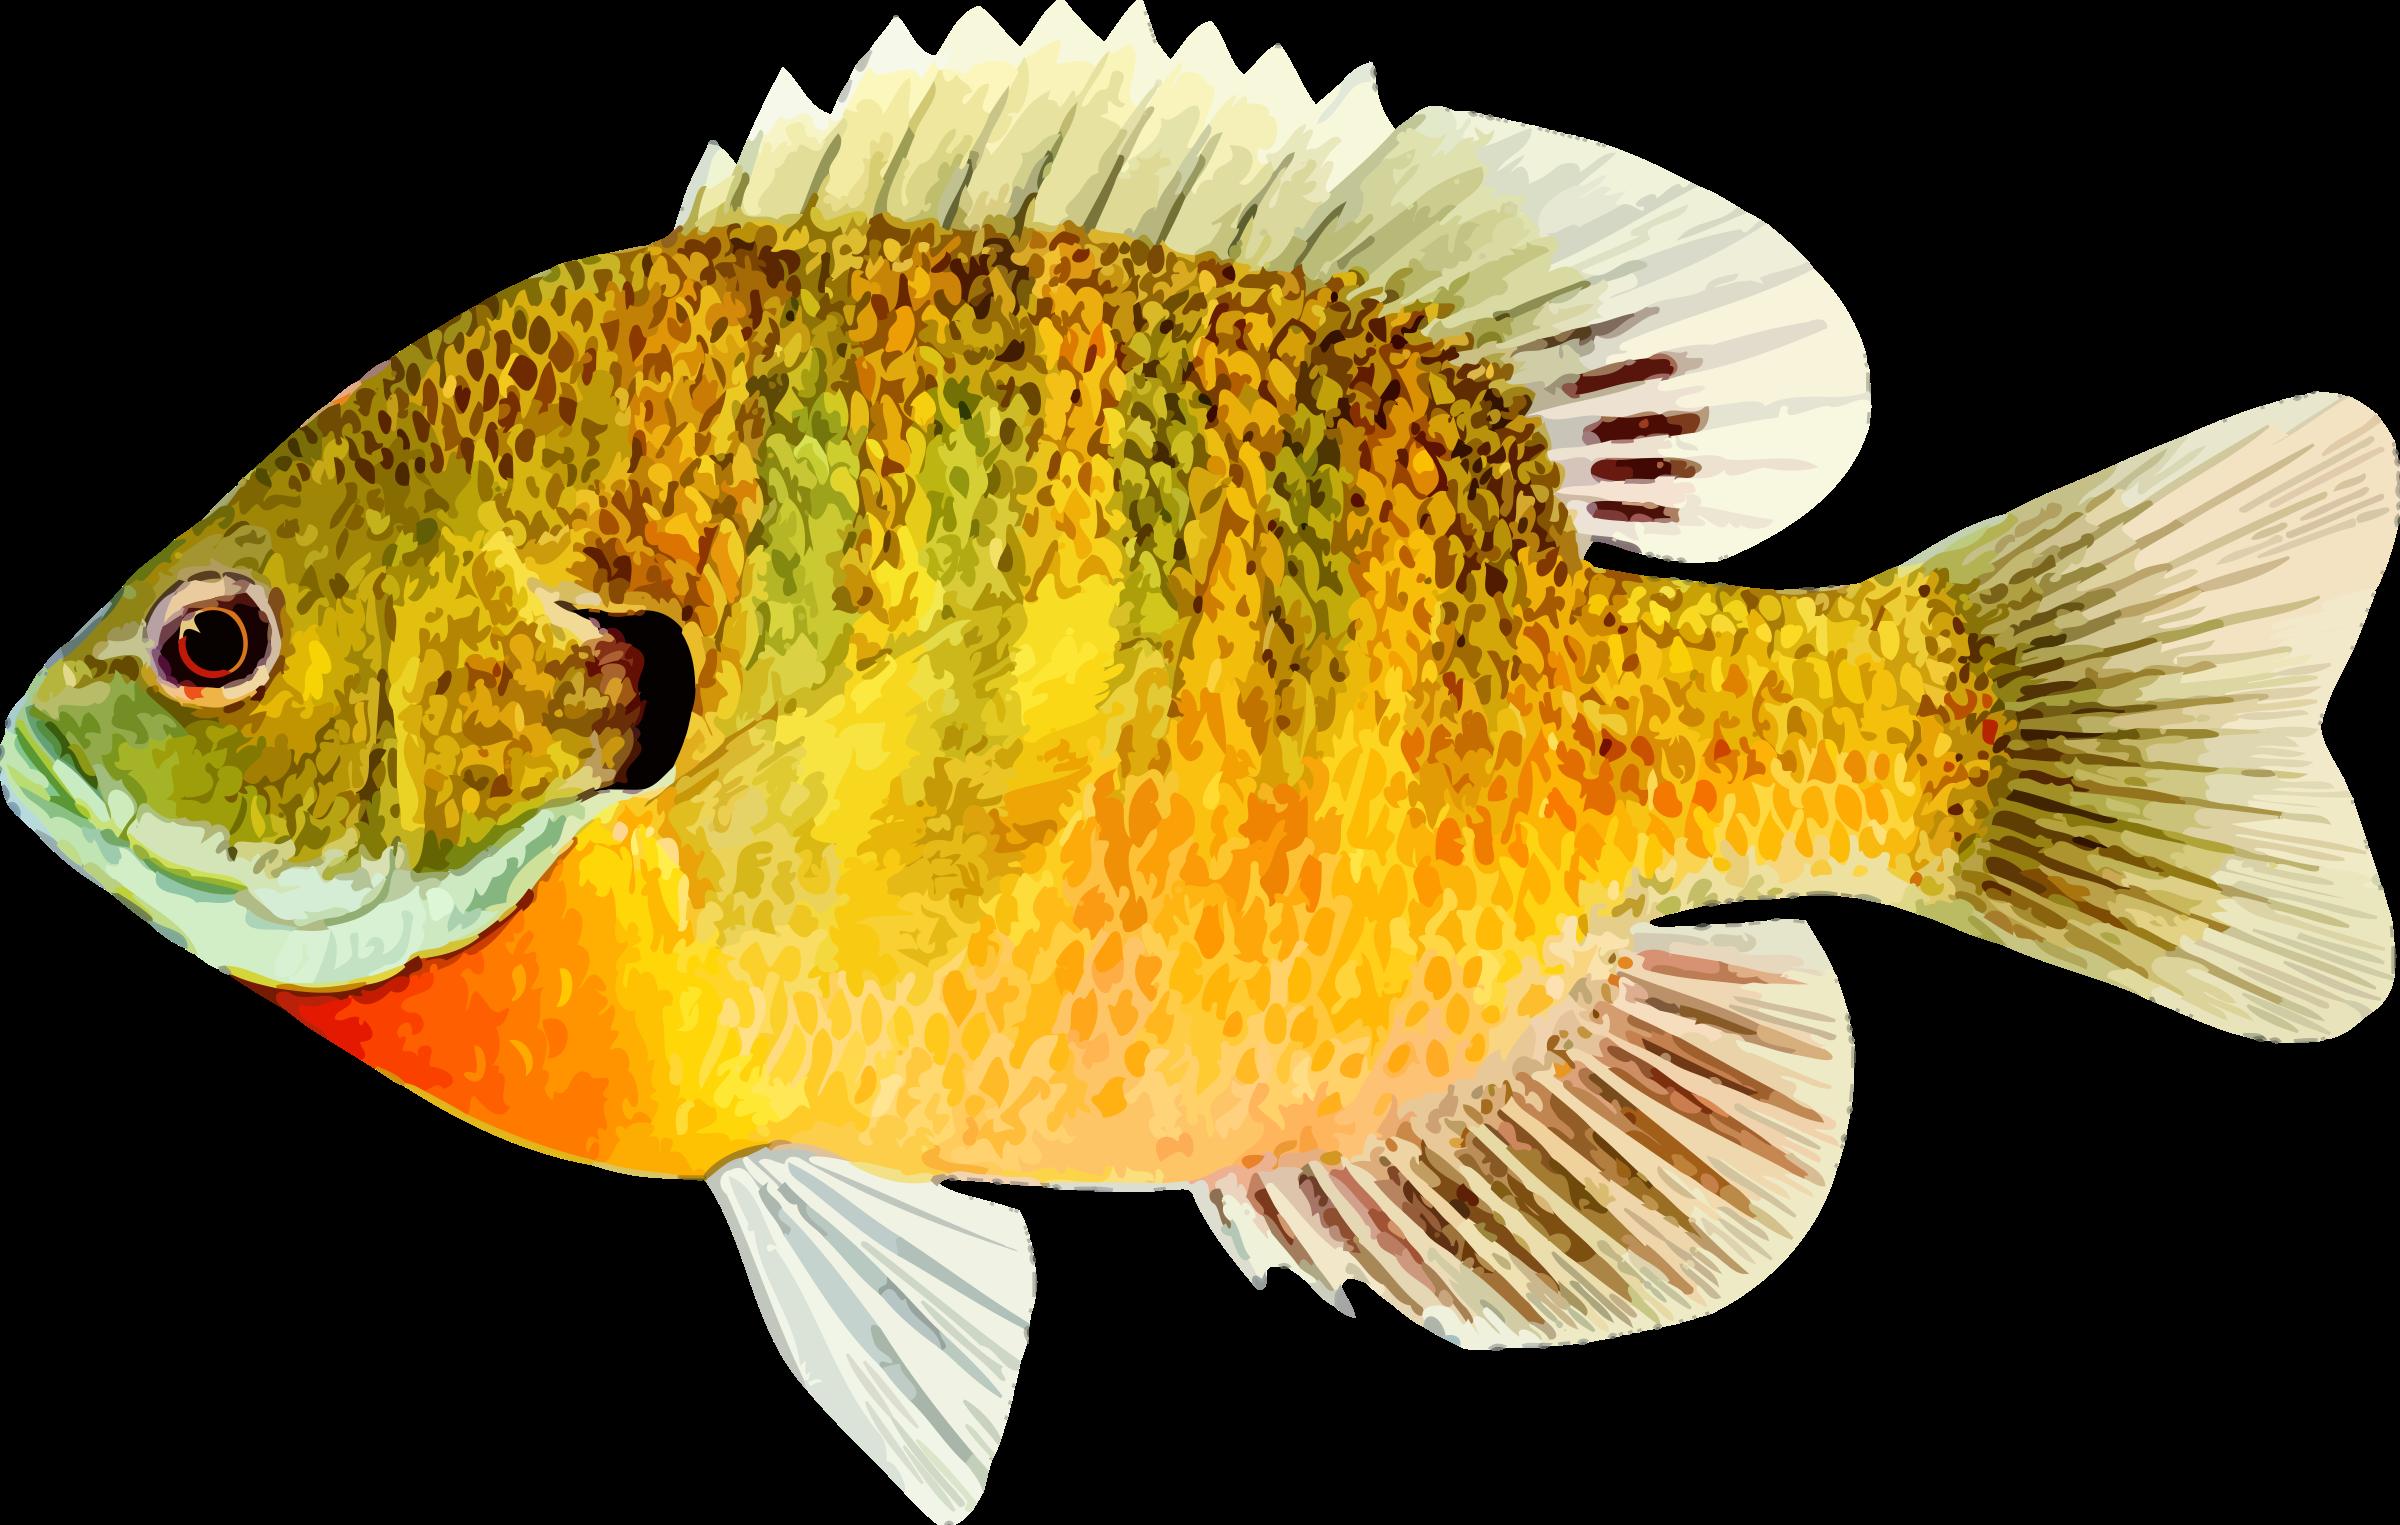 Fish HD PNG Transparent HDPNG Images